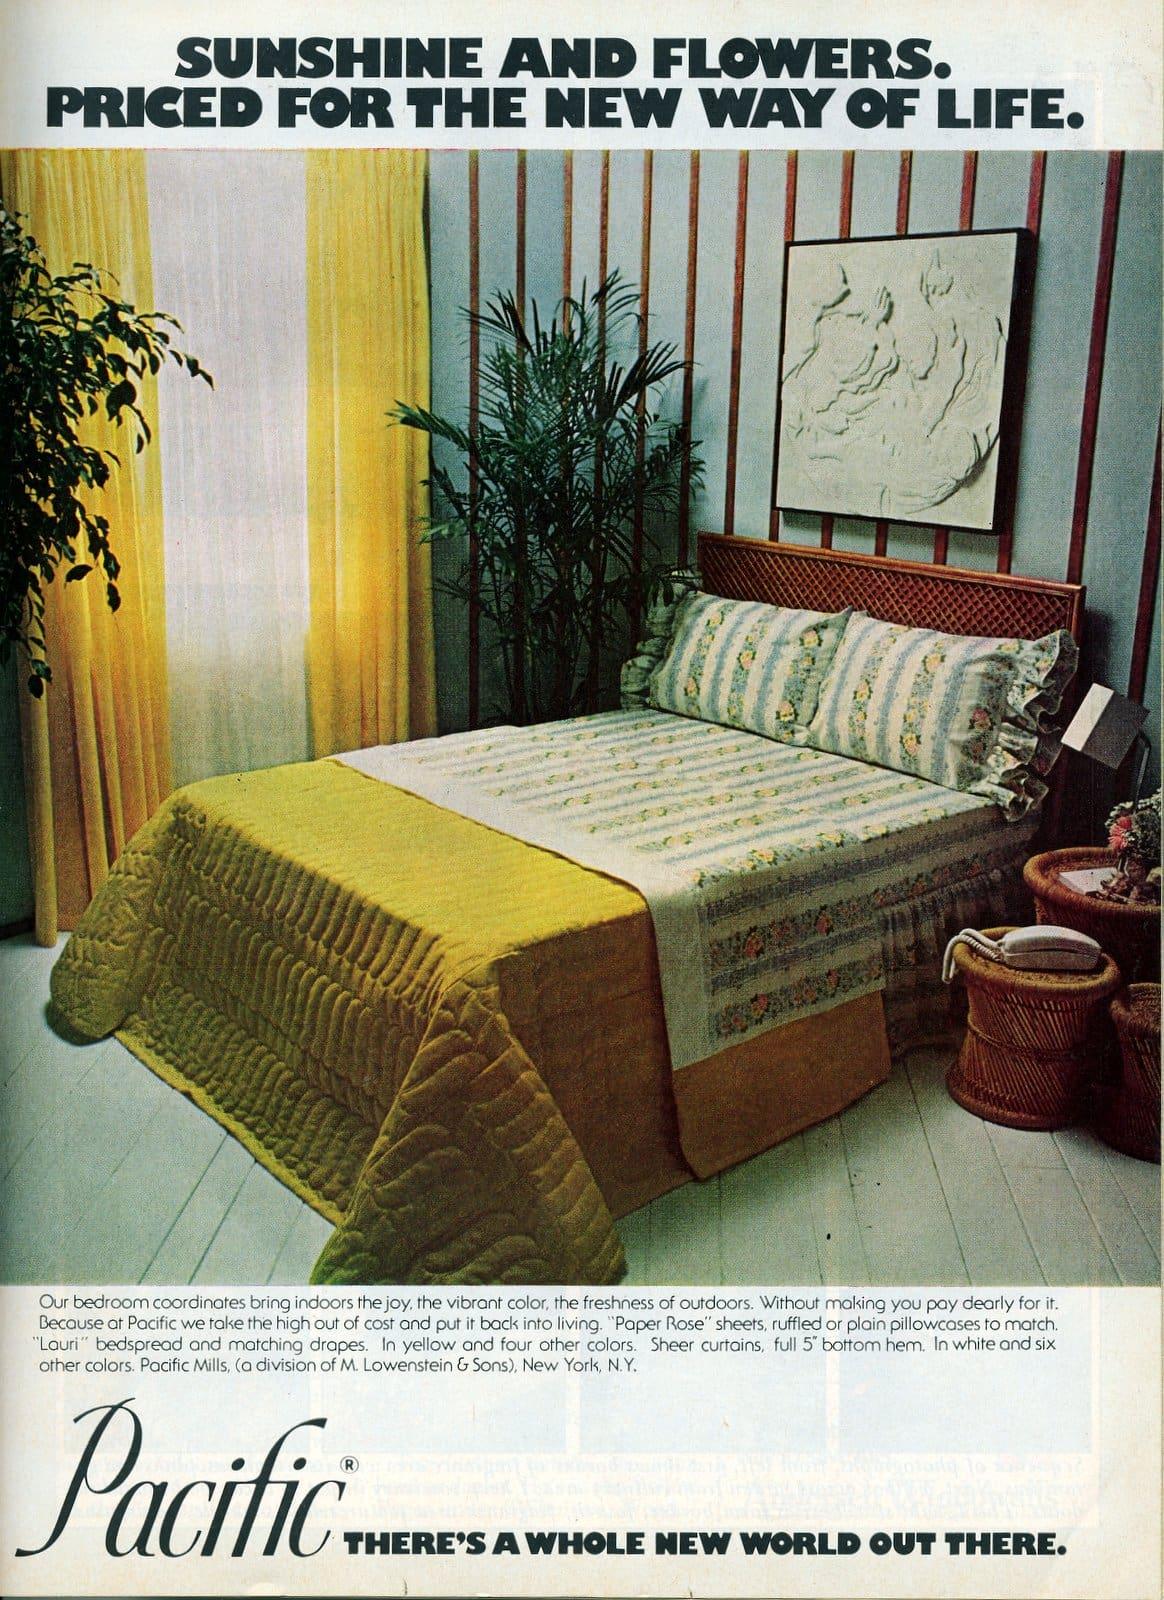 Coordinating vintage bedspread and sheets (1975)